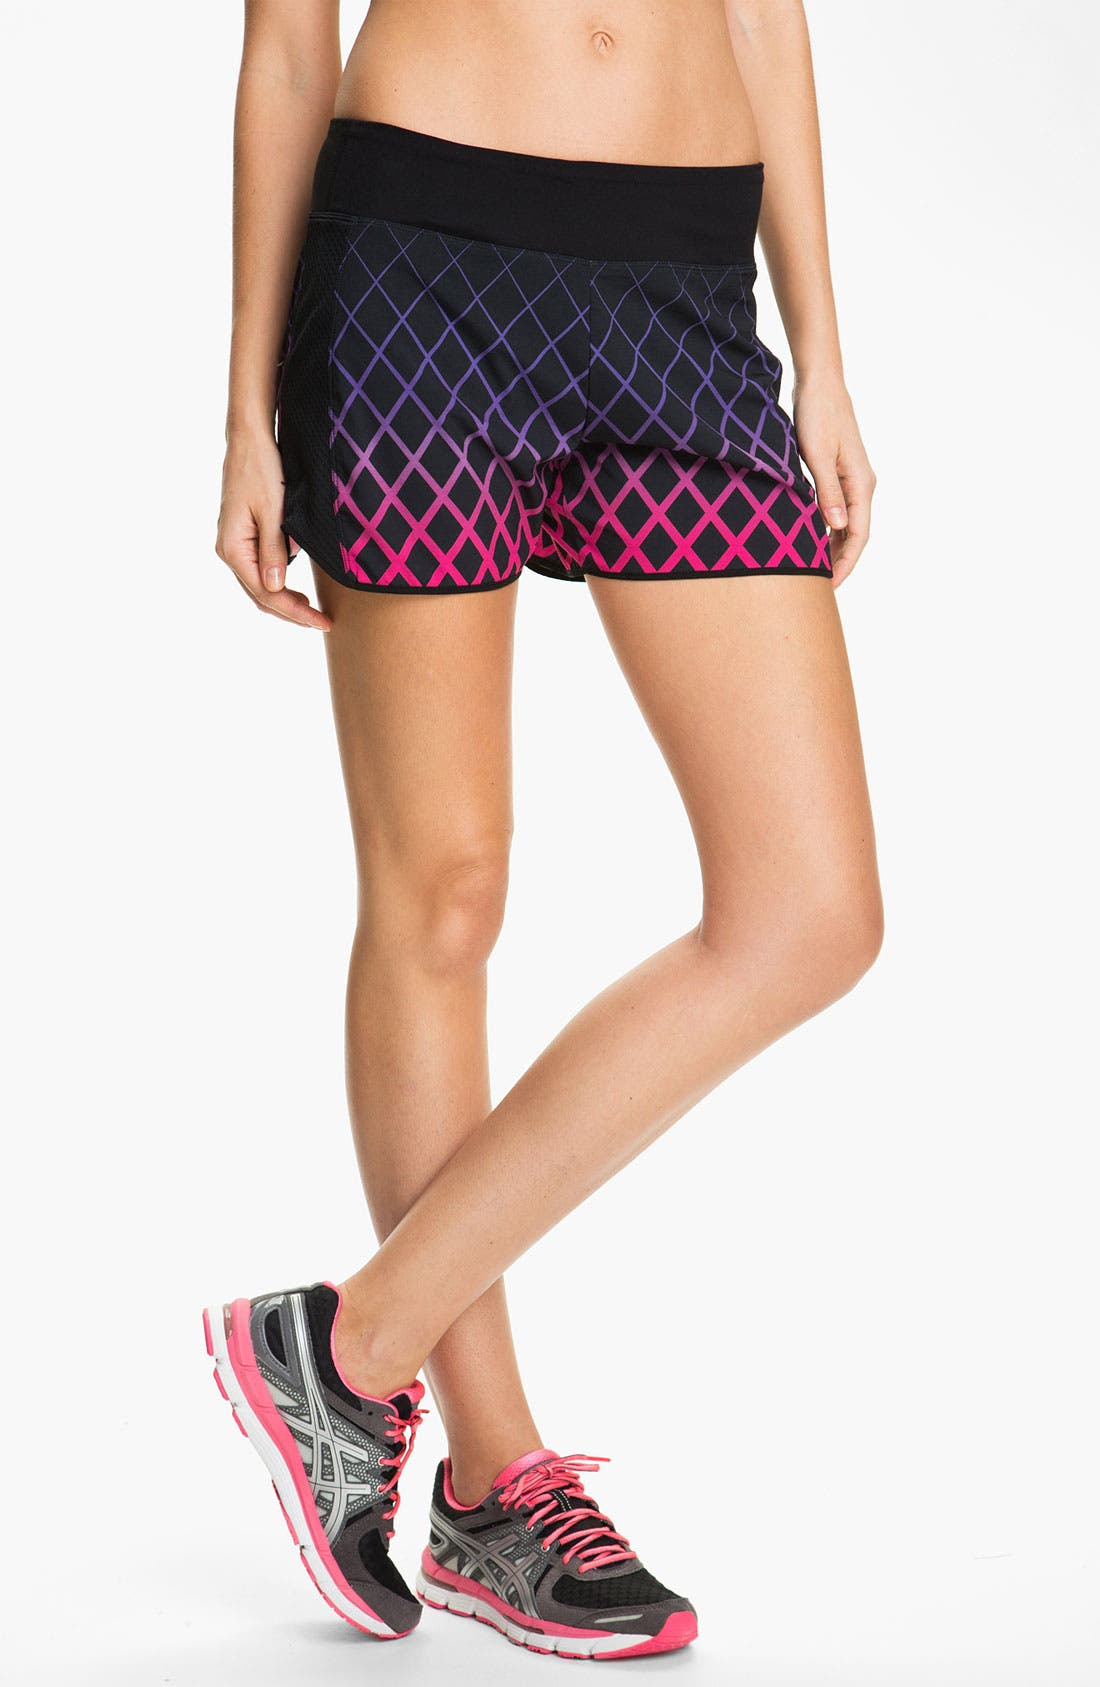 Alternate Image 1 Selected - ASICS® 'Karey' Shorts